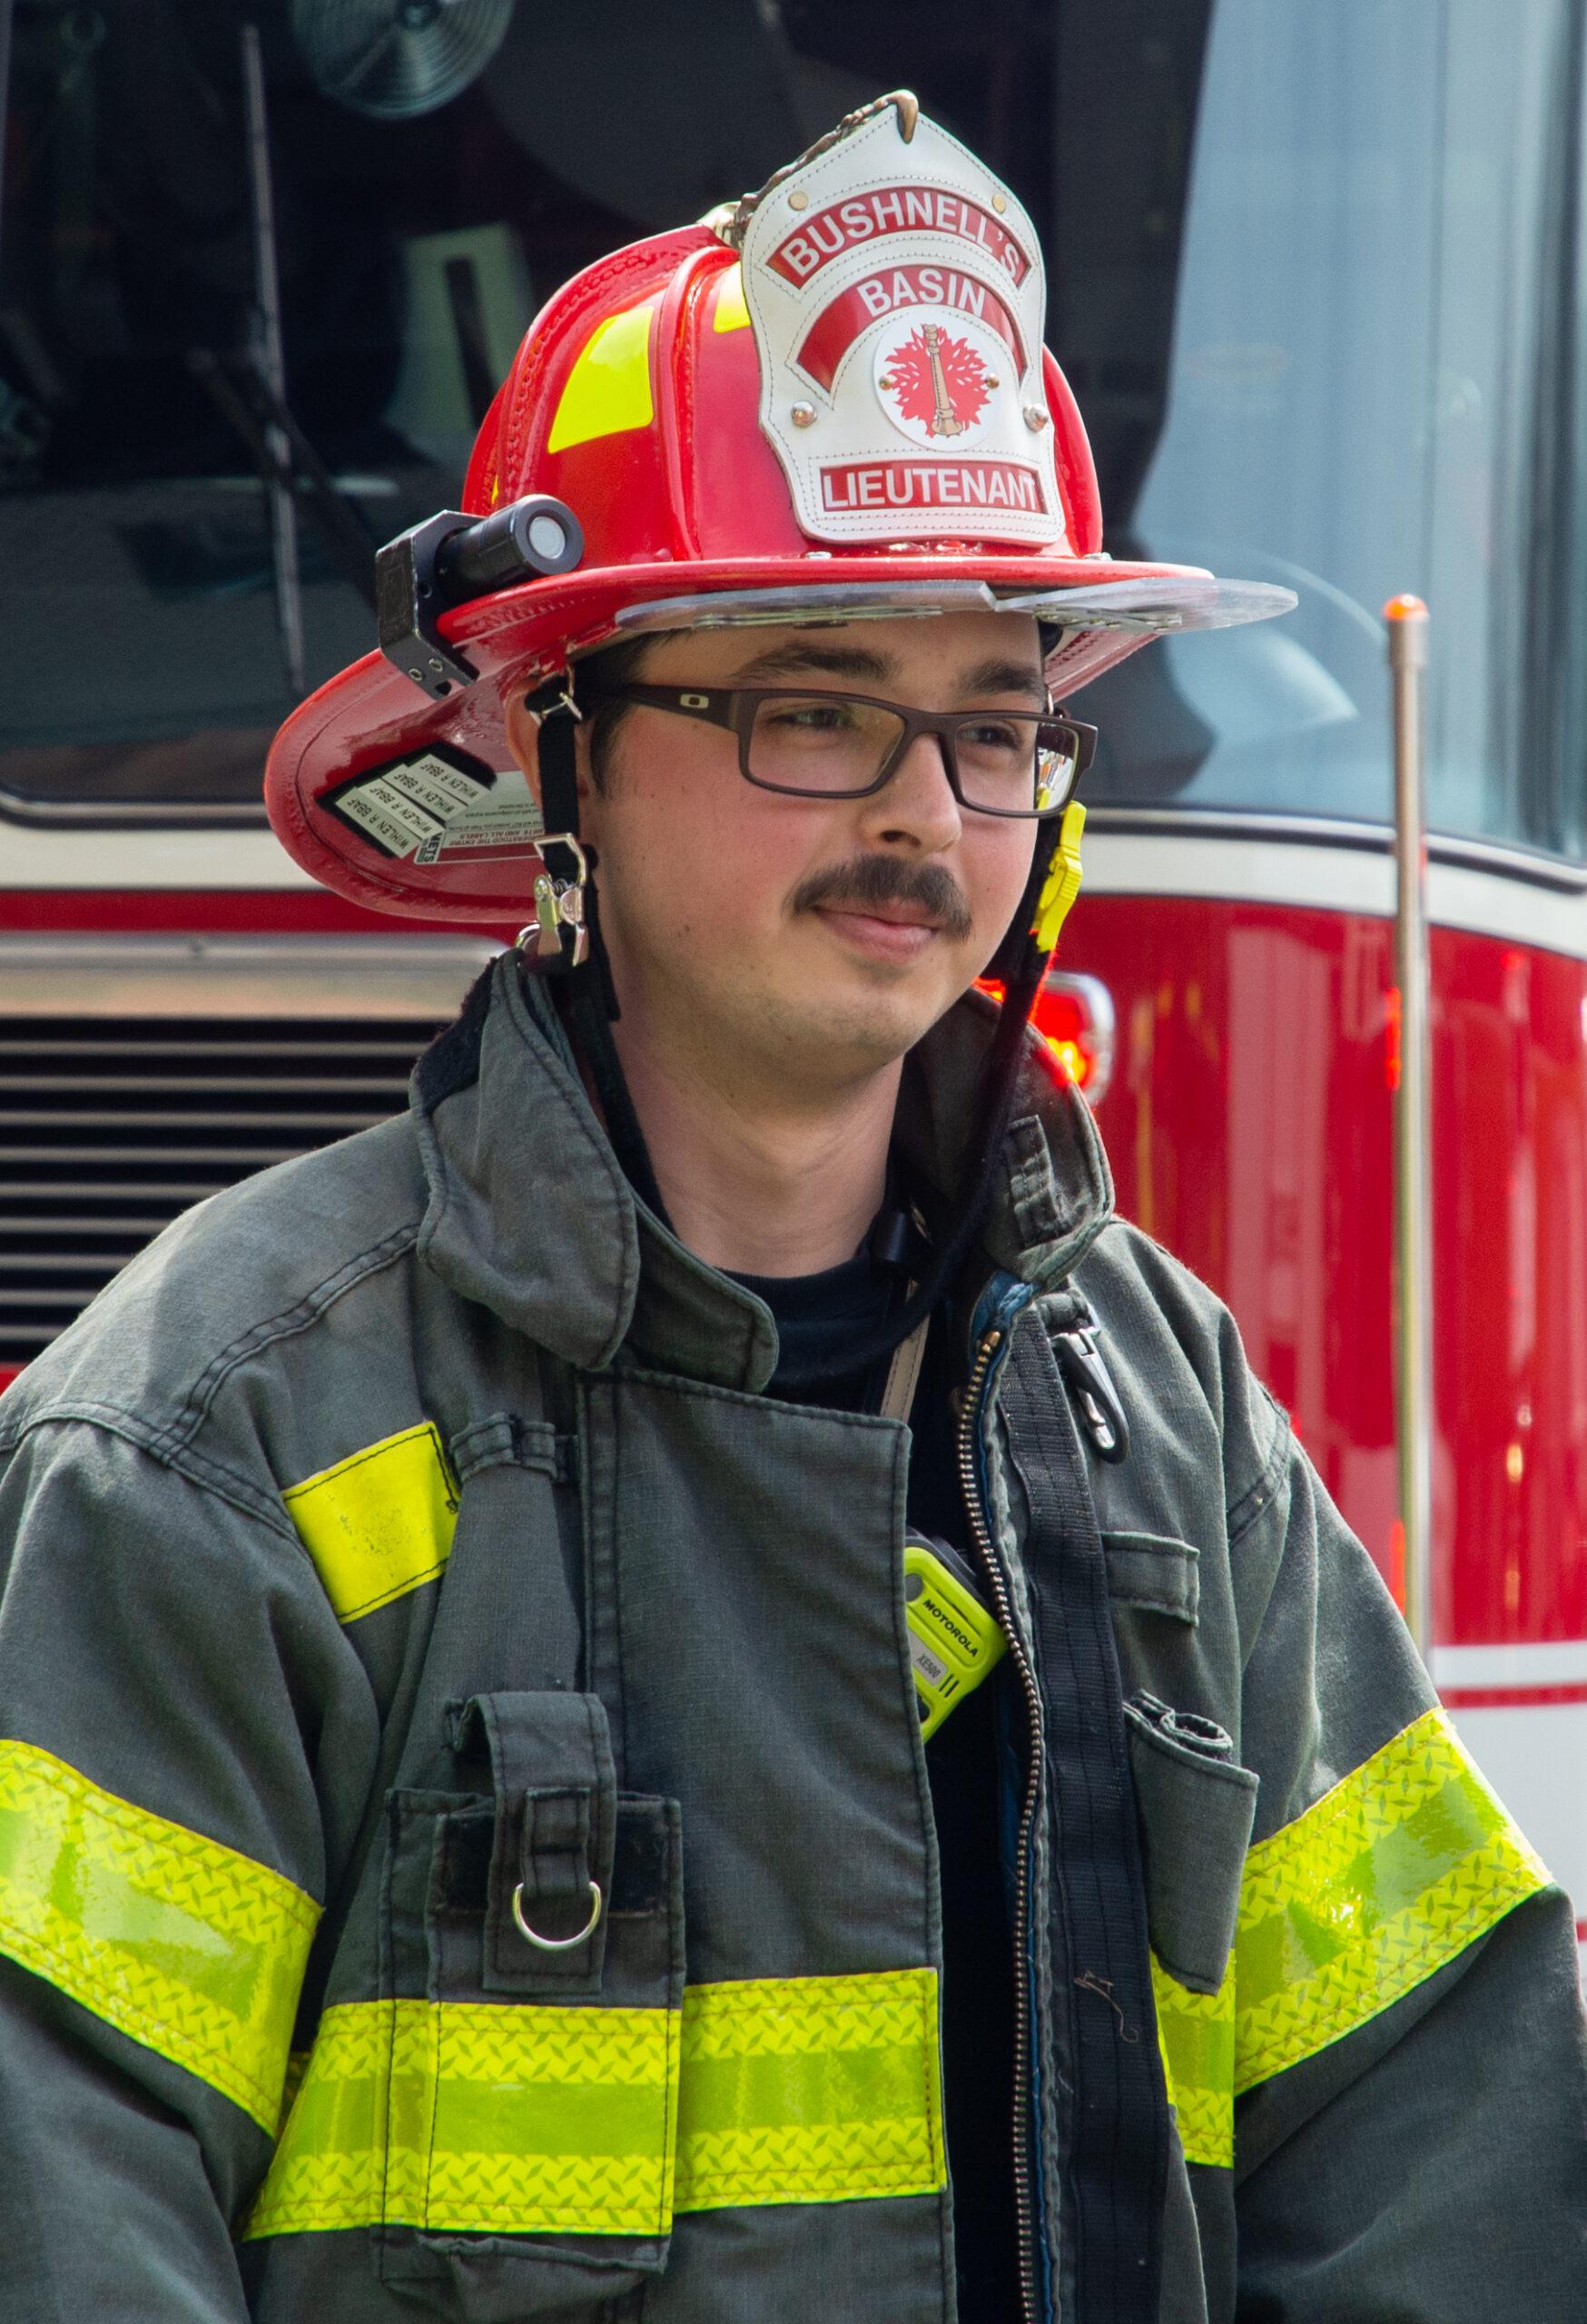 Robert Wihlen : Lieutenant